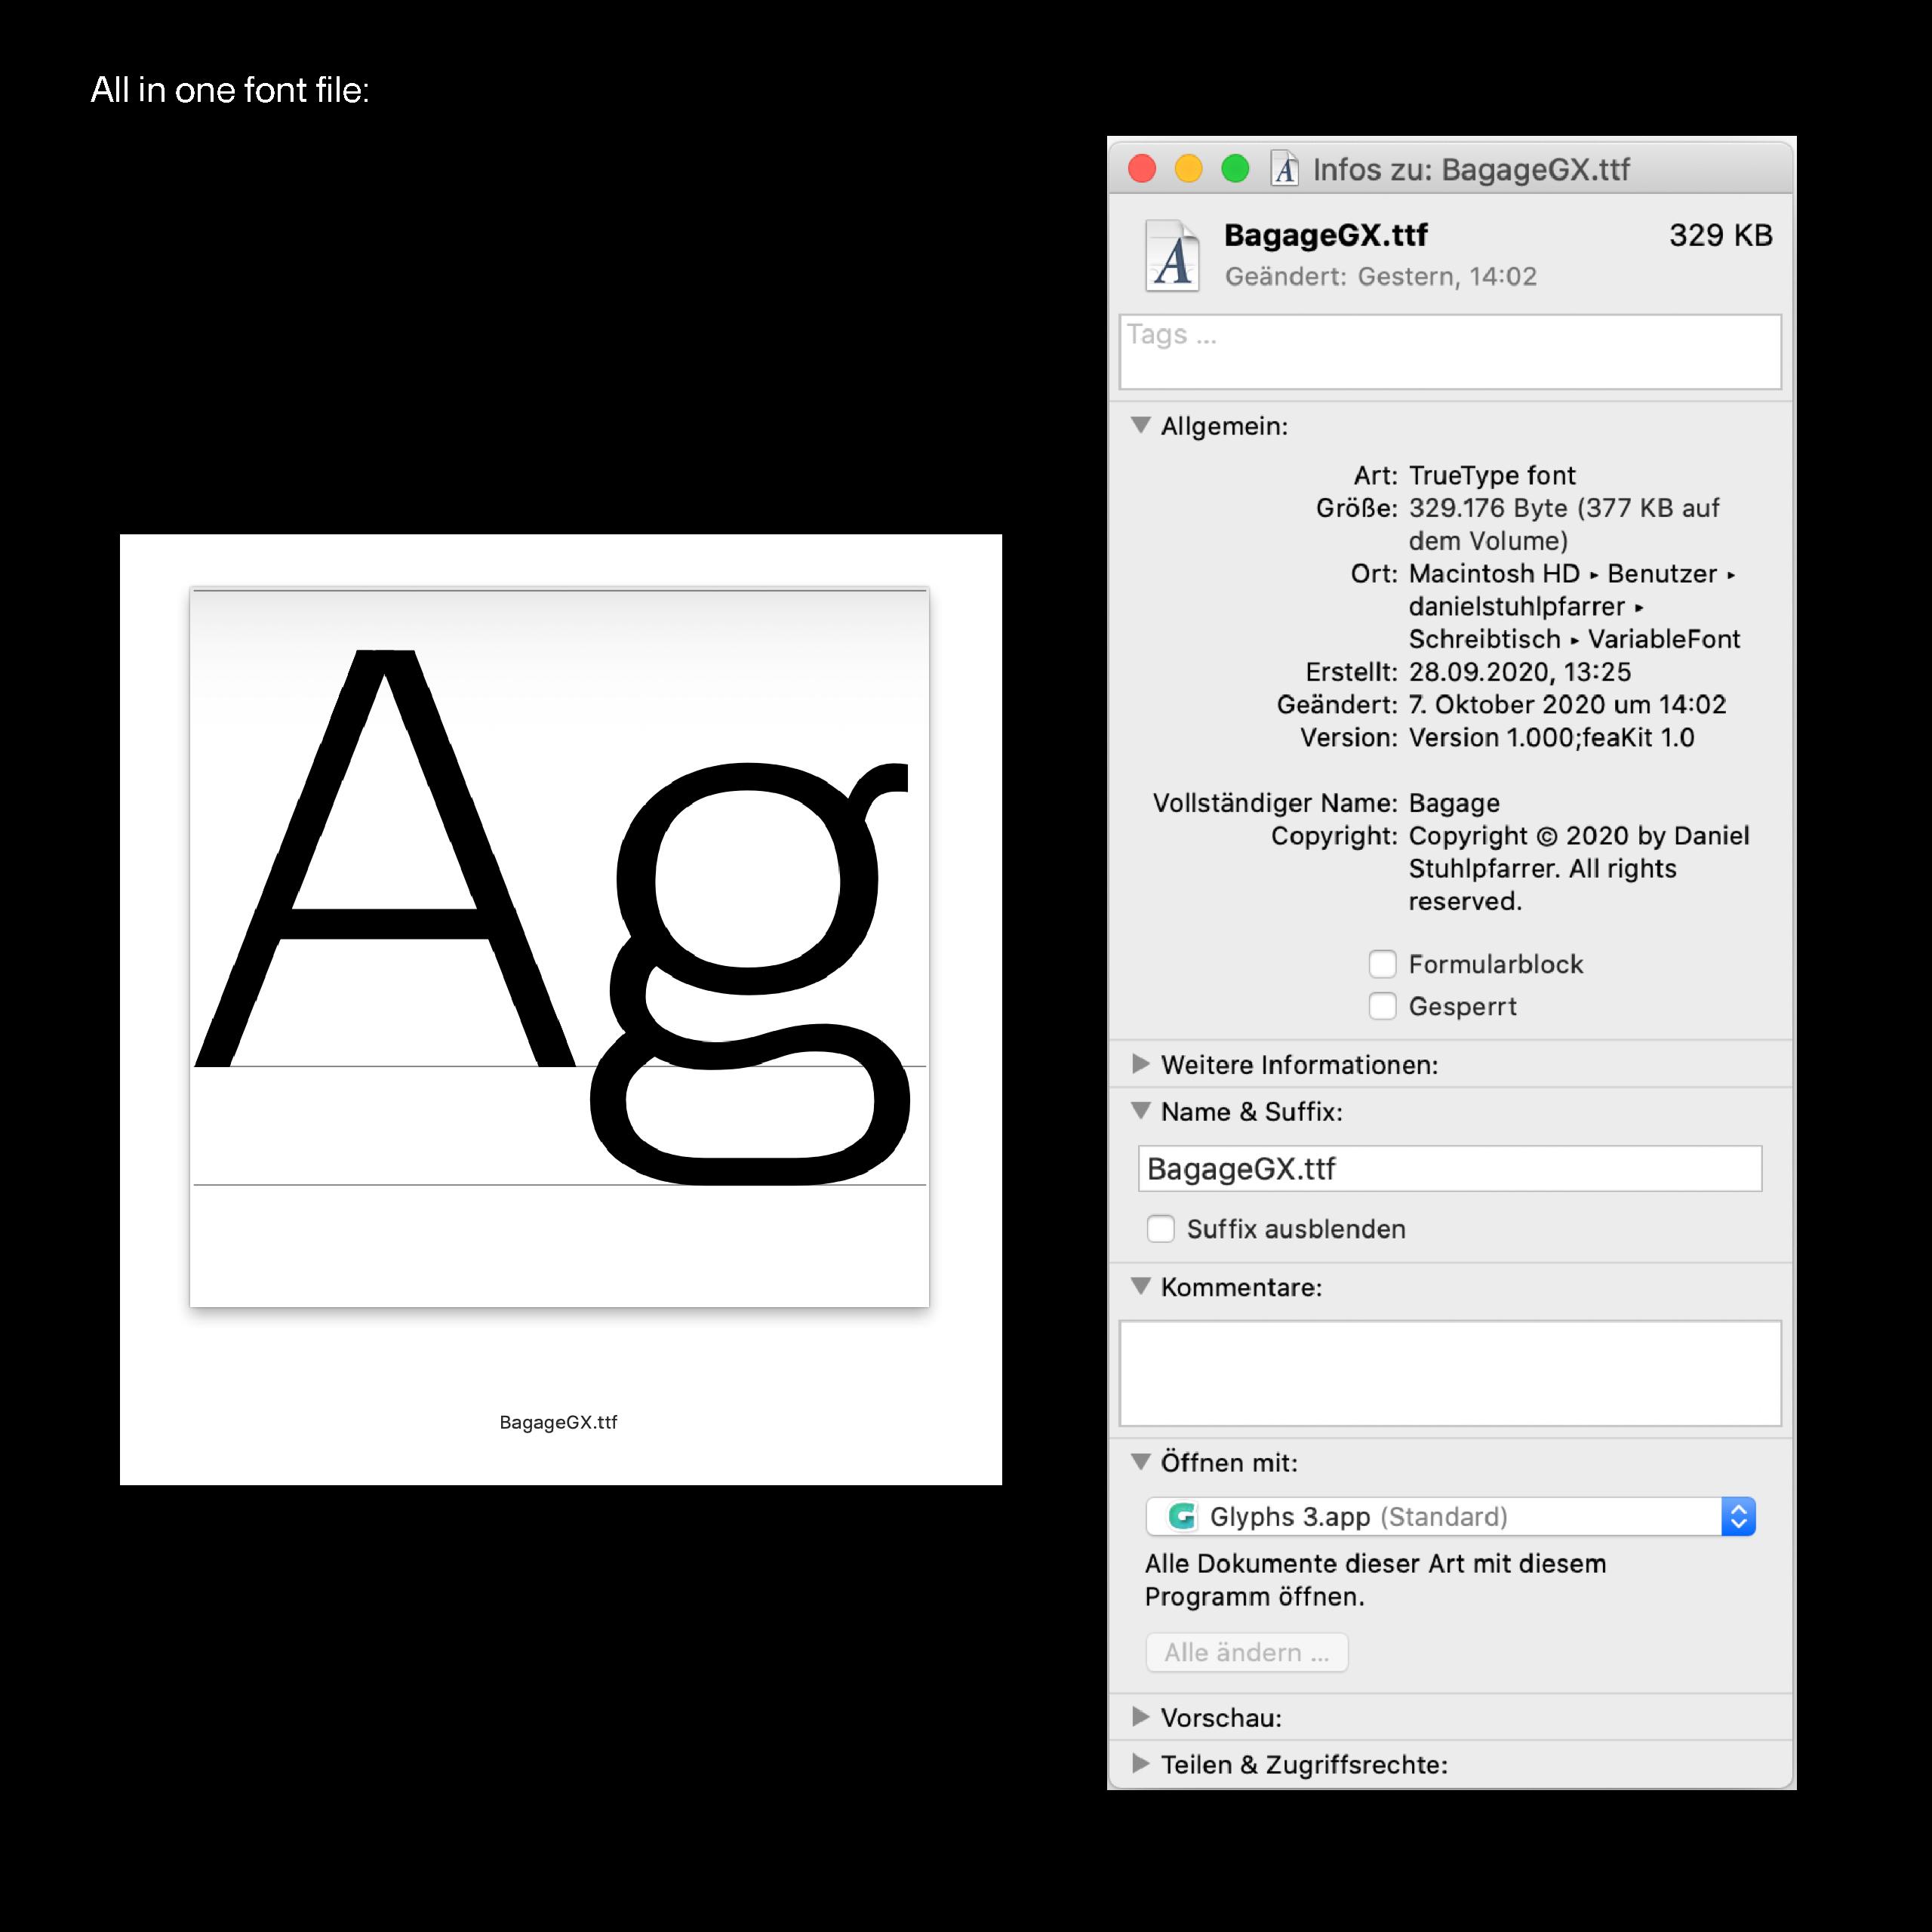 Daniel_Stuhlpfarrer_Spekulative-Schriftgestaltung-Speculative-Type-Design_WEB35